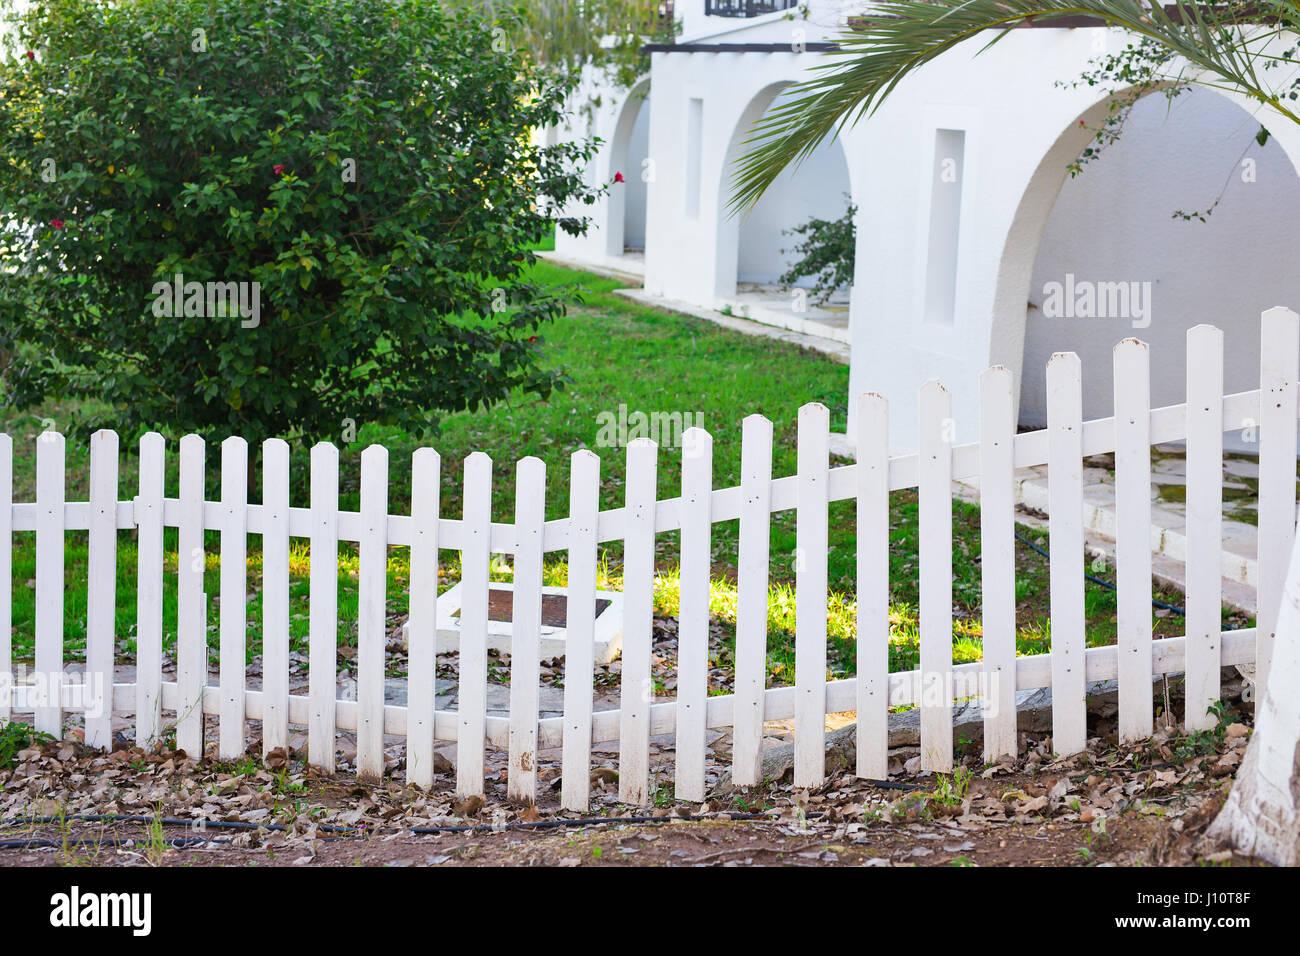 weißer zaun und grasgrün stockfoto, bild: 138316655 - alamy